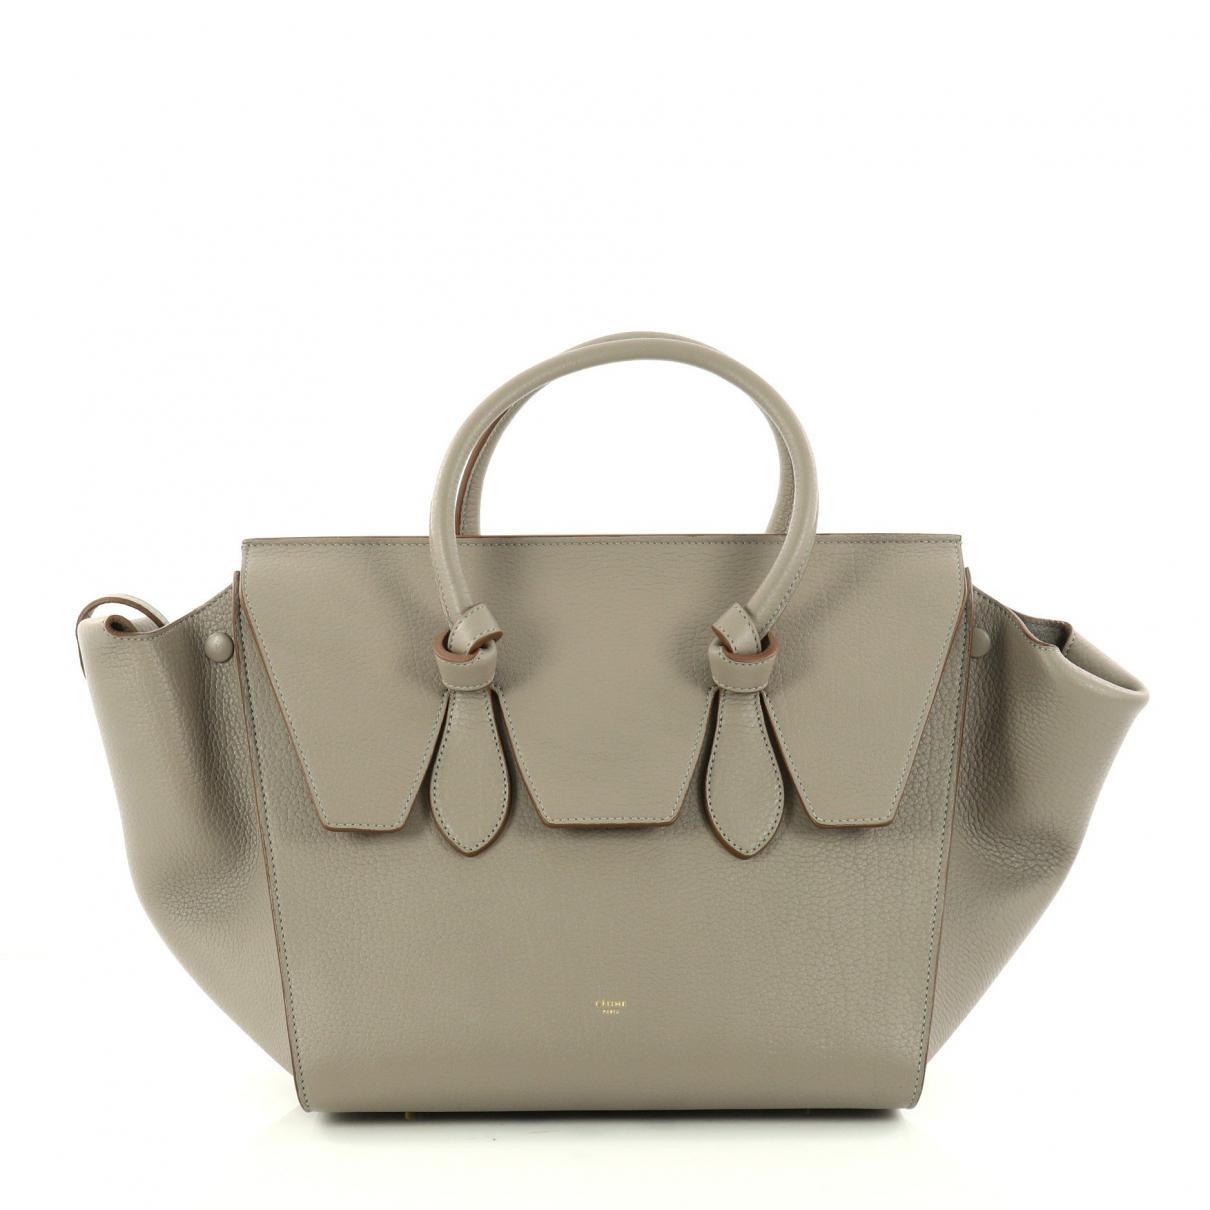 26ec9a367b Céline Tie Leather Handbag in Gray - Lyst